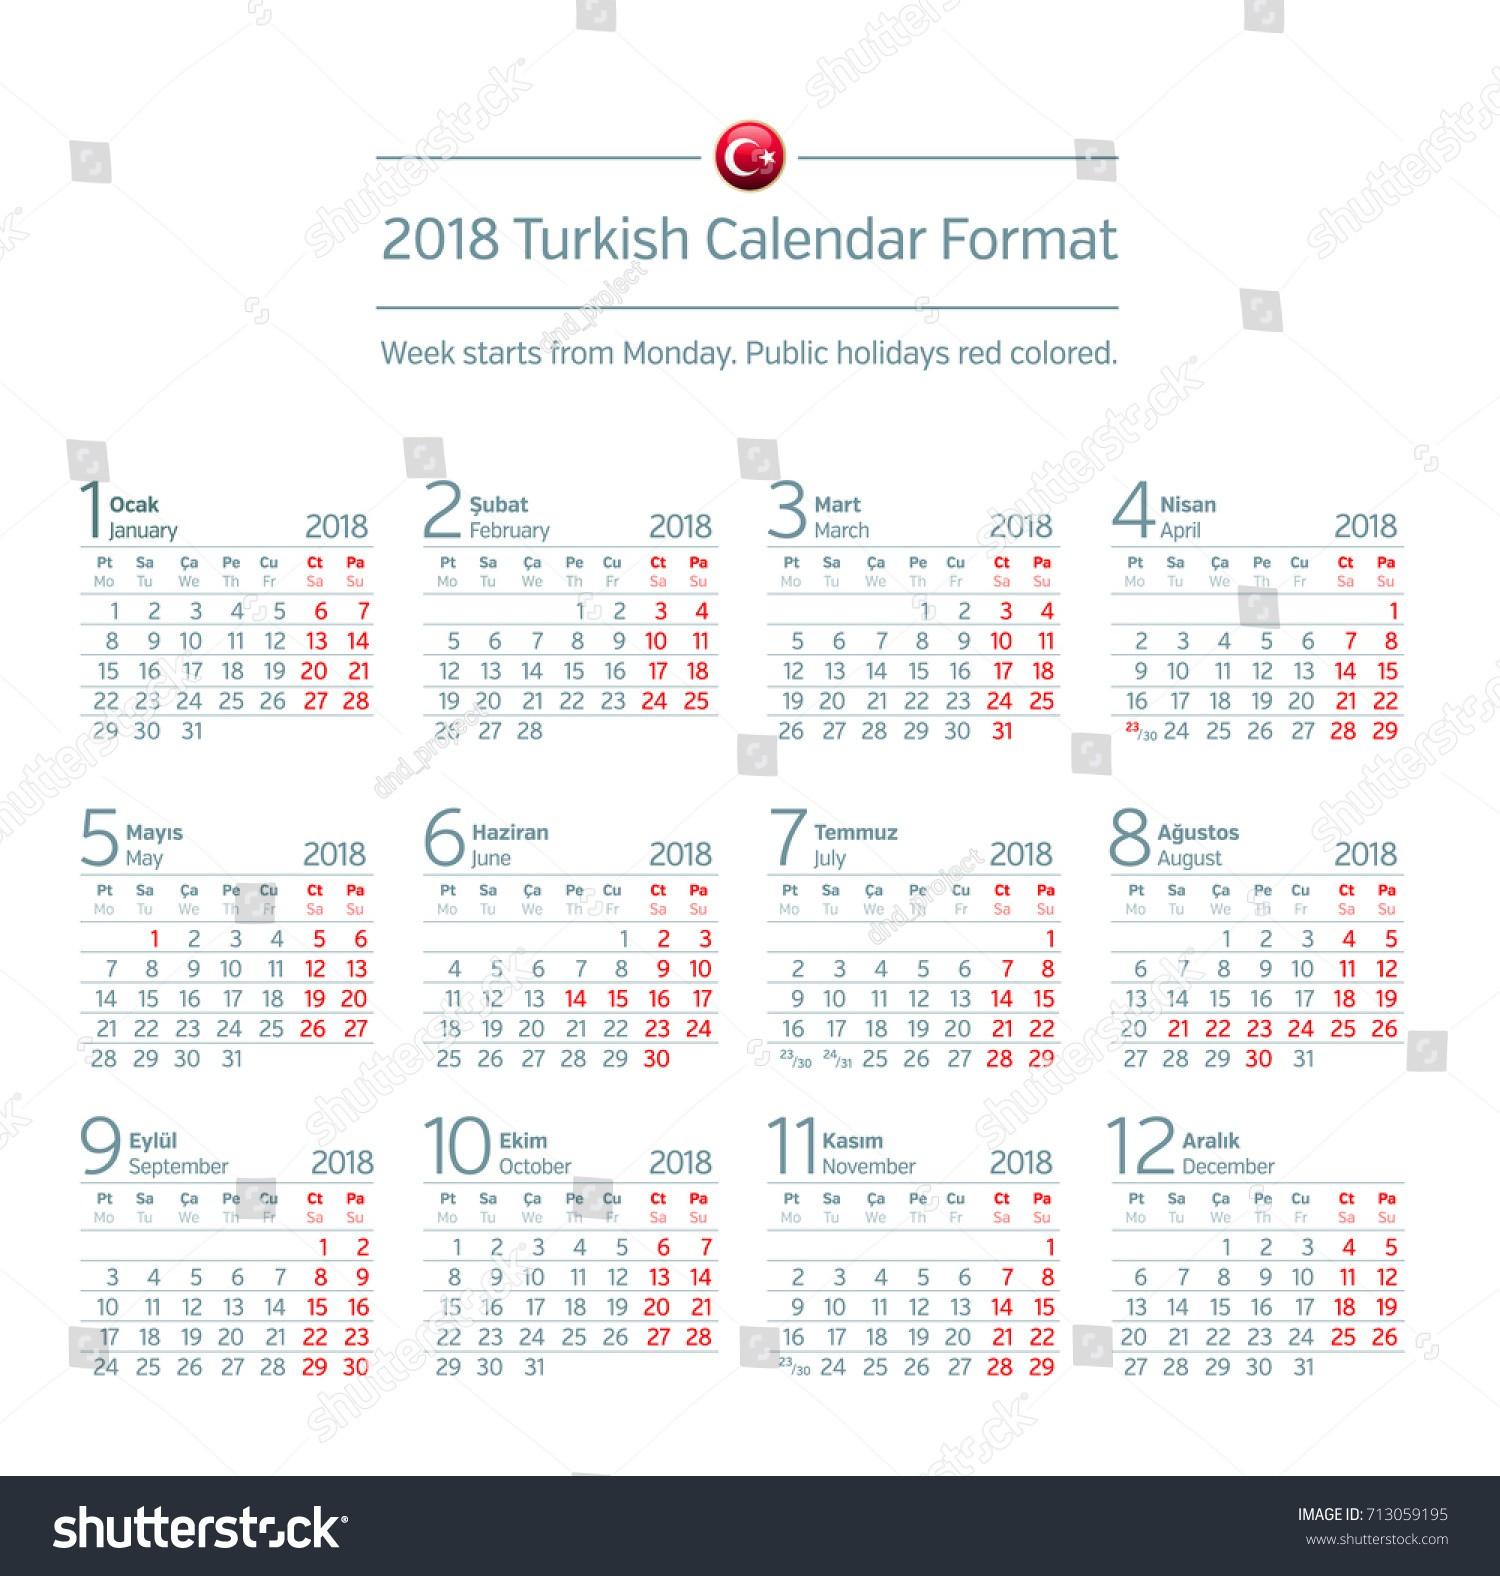 2019 Calendar Philippines Excel Recientes October 2018 Calendar Public Holidays Of 2019 Calendar Philippines Excel Más Recientes Best Create Calendar Template Year Calendar Template